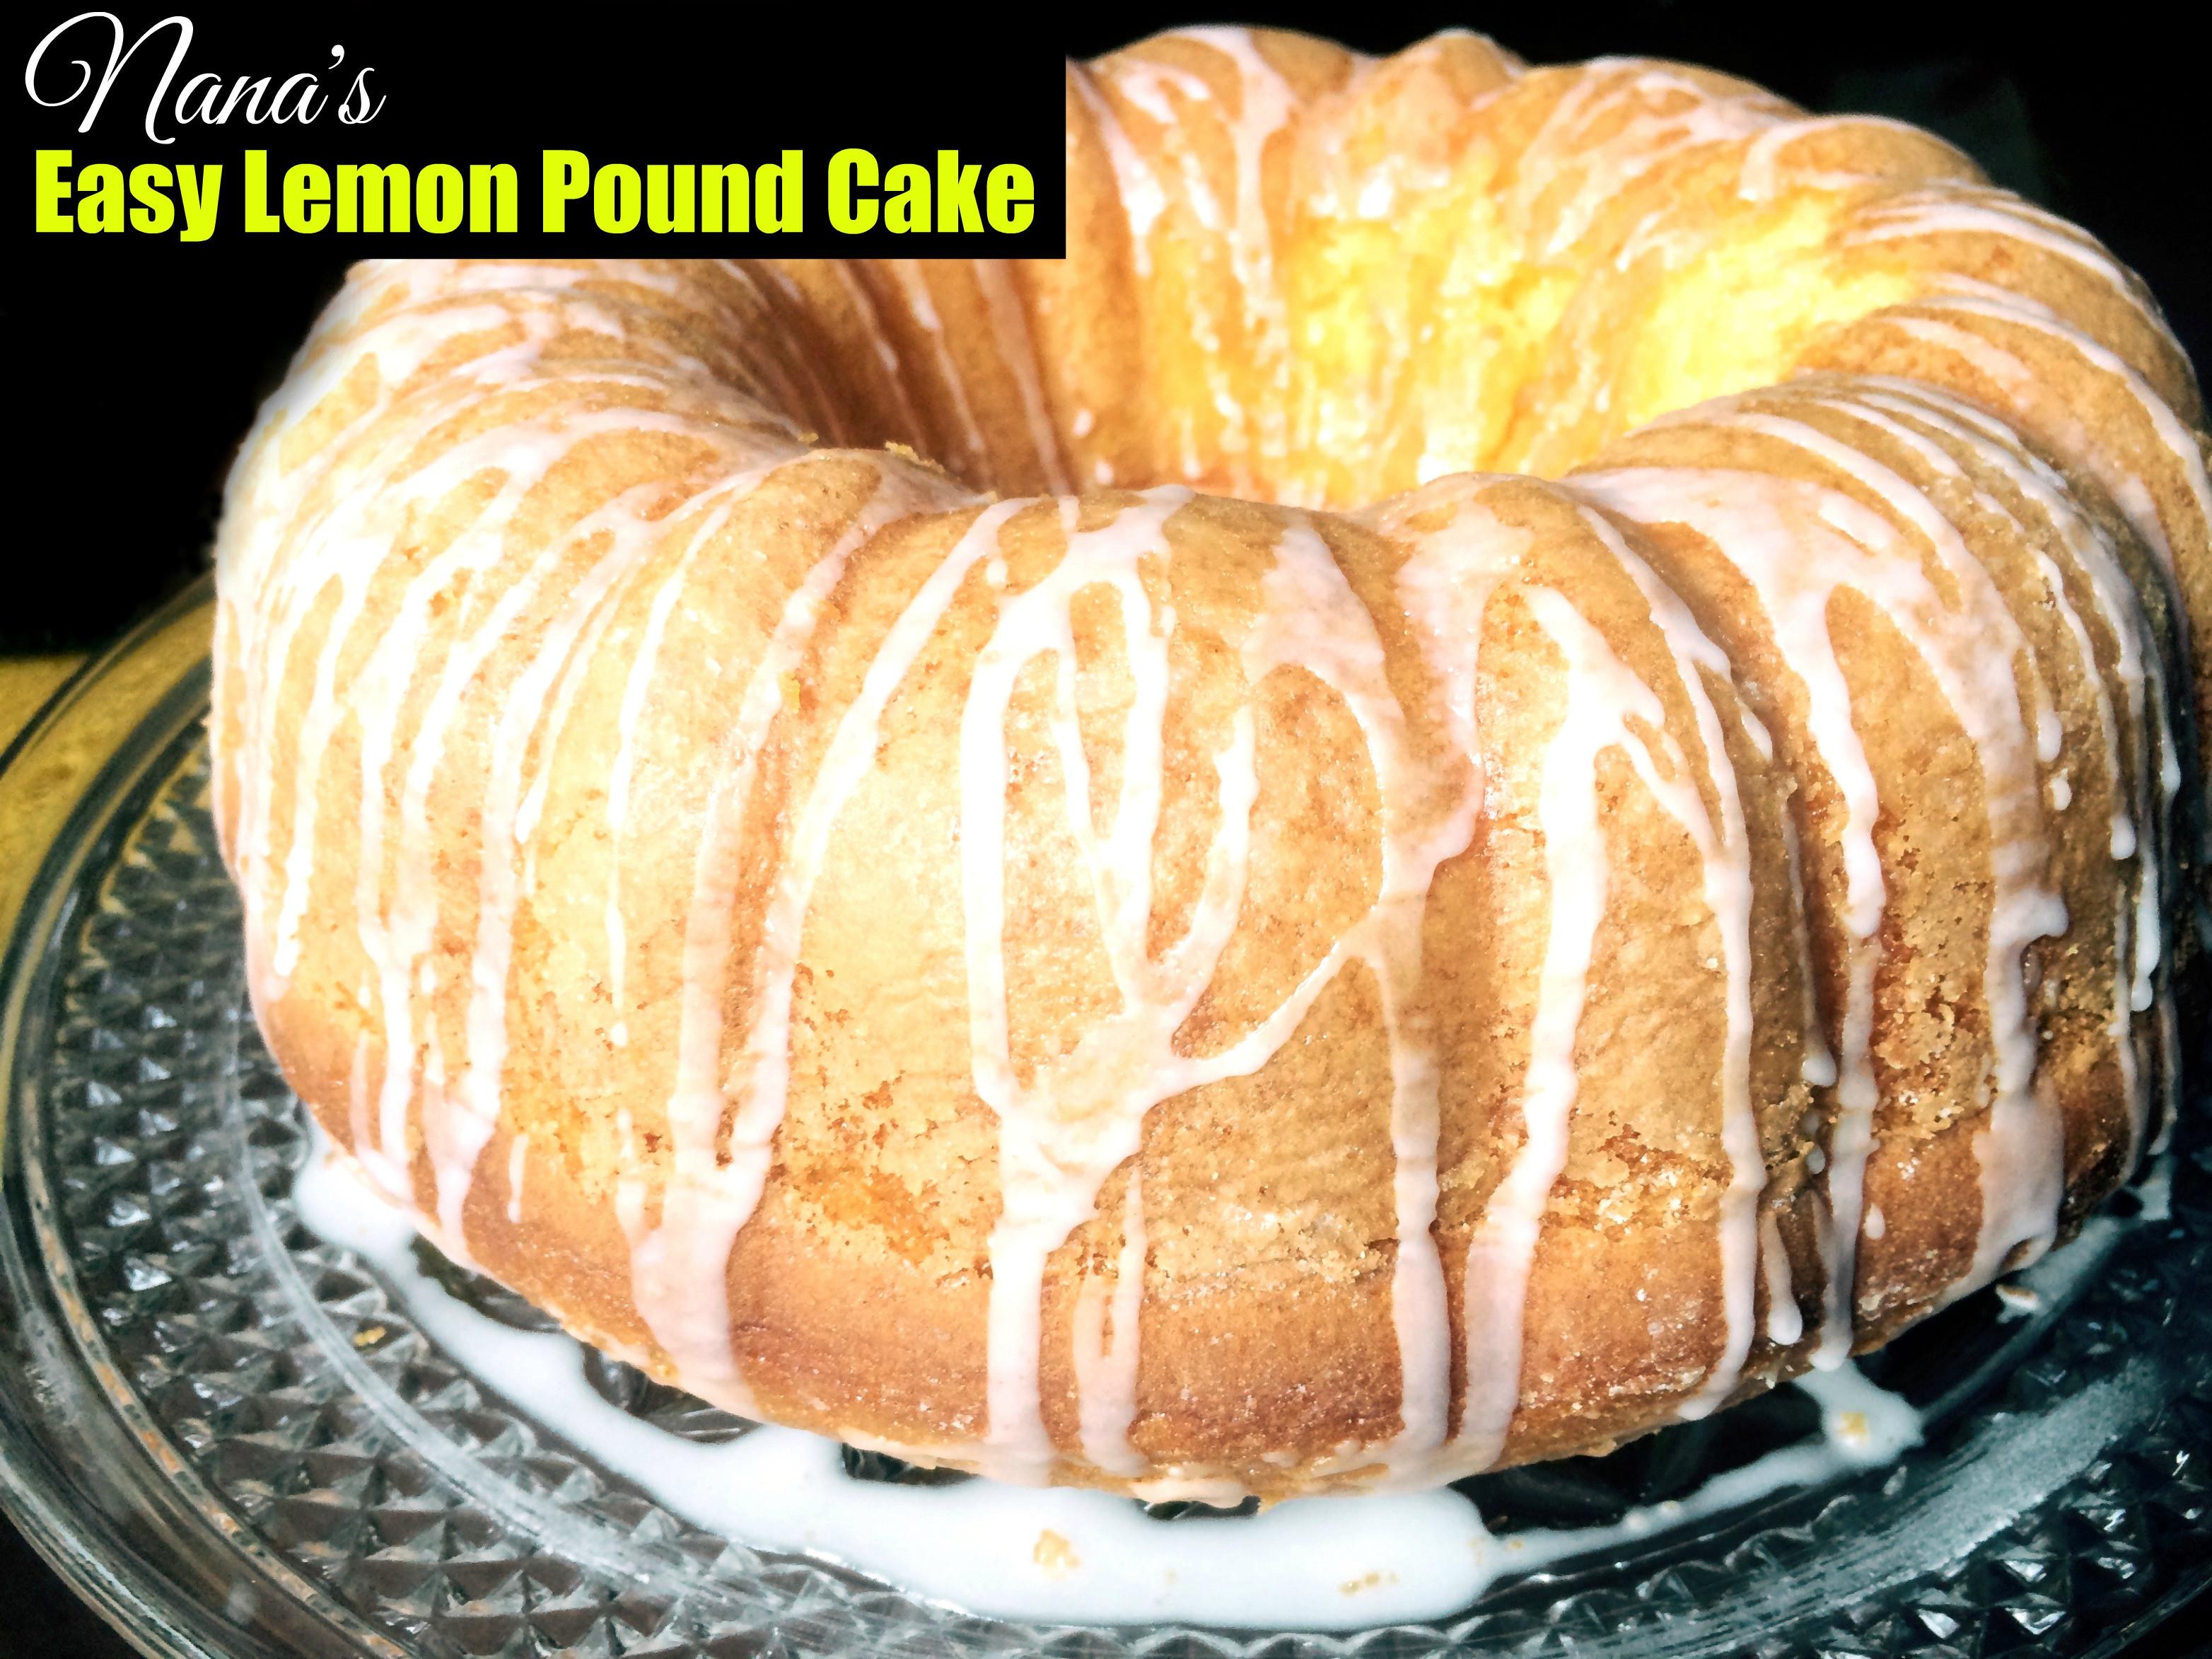 Easy Lemon Pound Cake  Nana s Easy Lemon Pound Cake Aunt Bee s Recipes